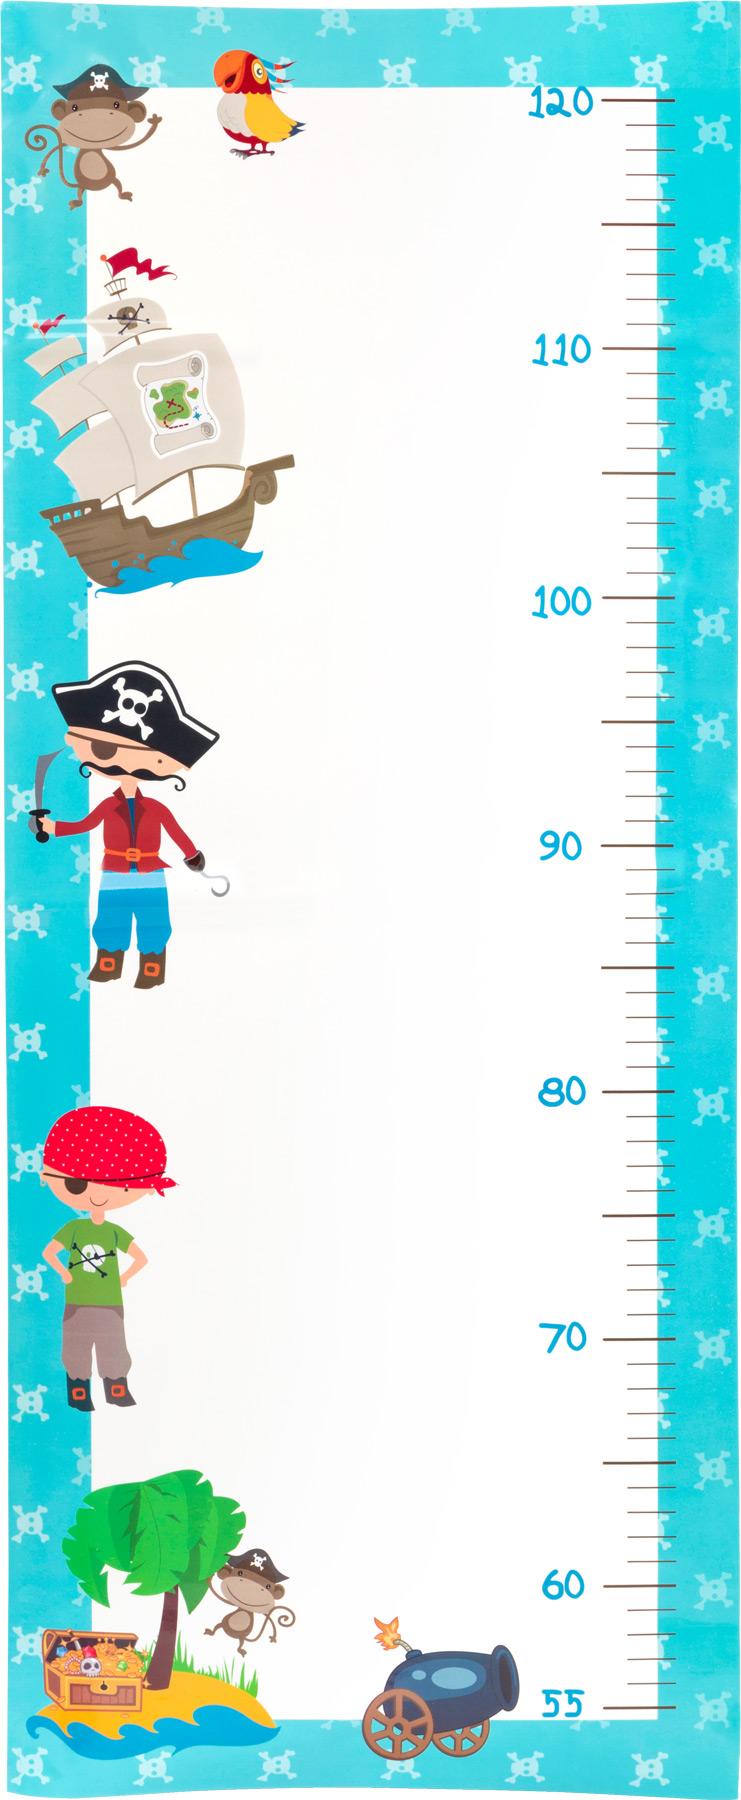 Small Foot Měřící metr piráti